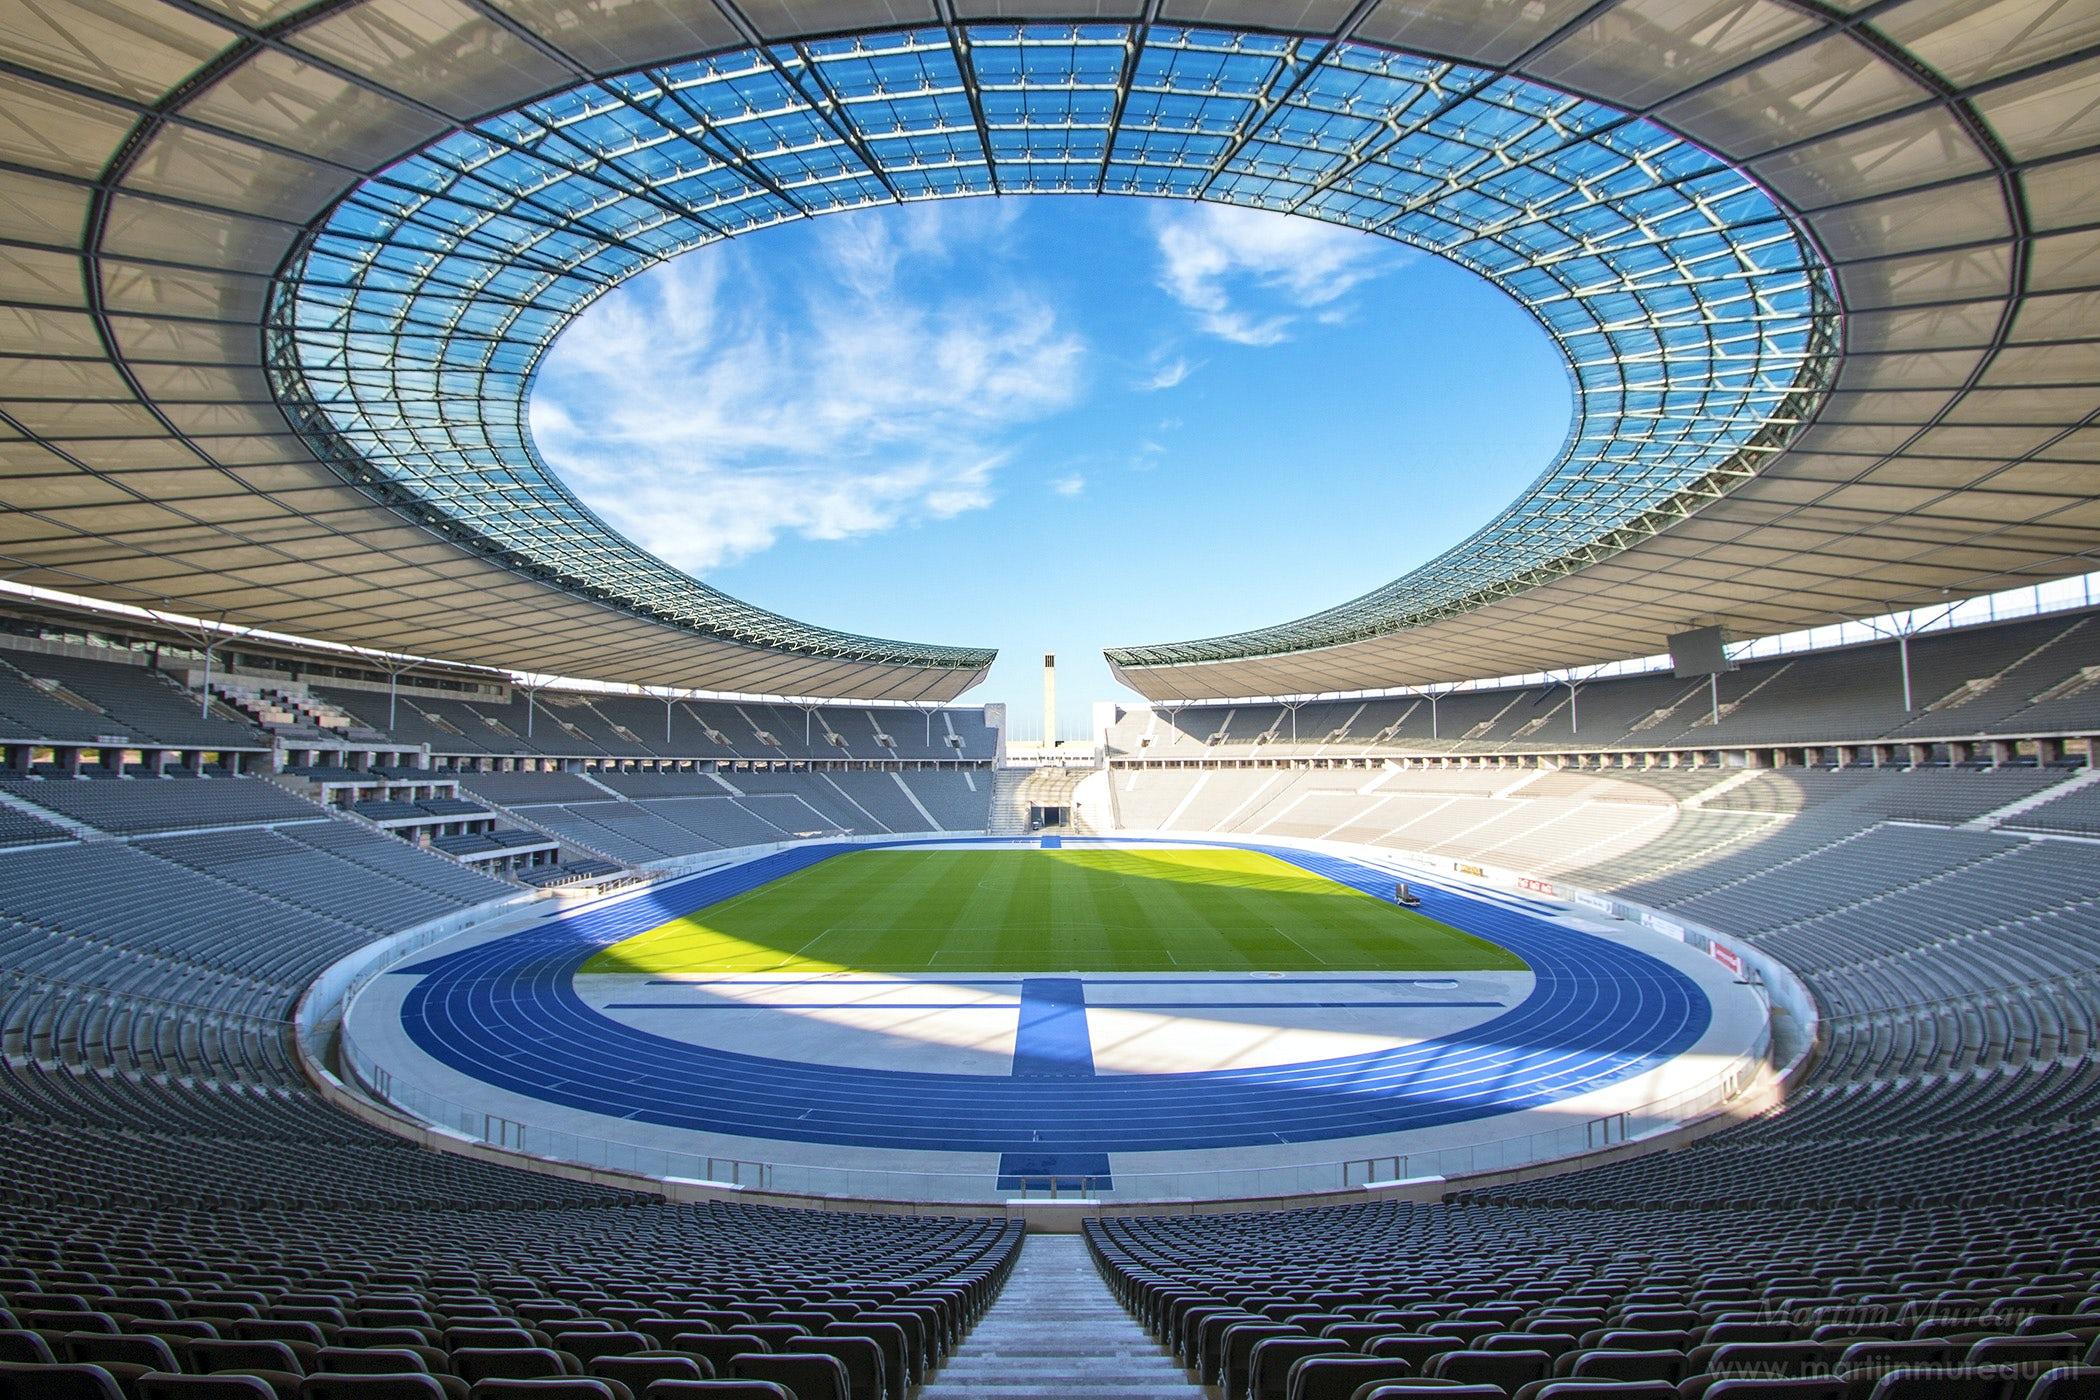 Olympiastadion Berlin